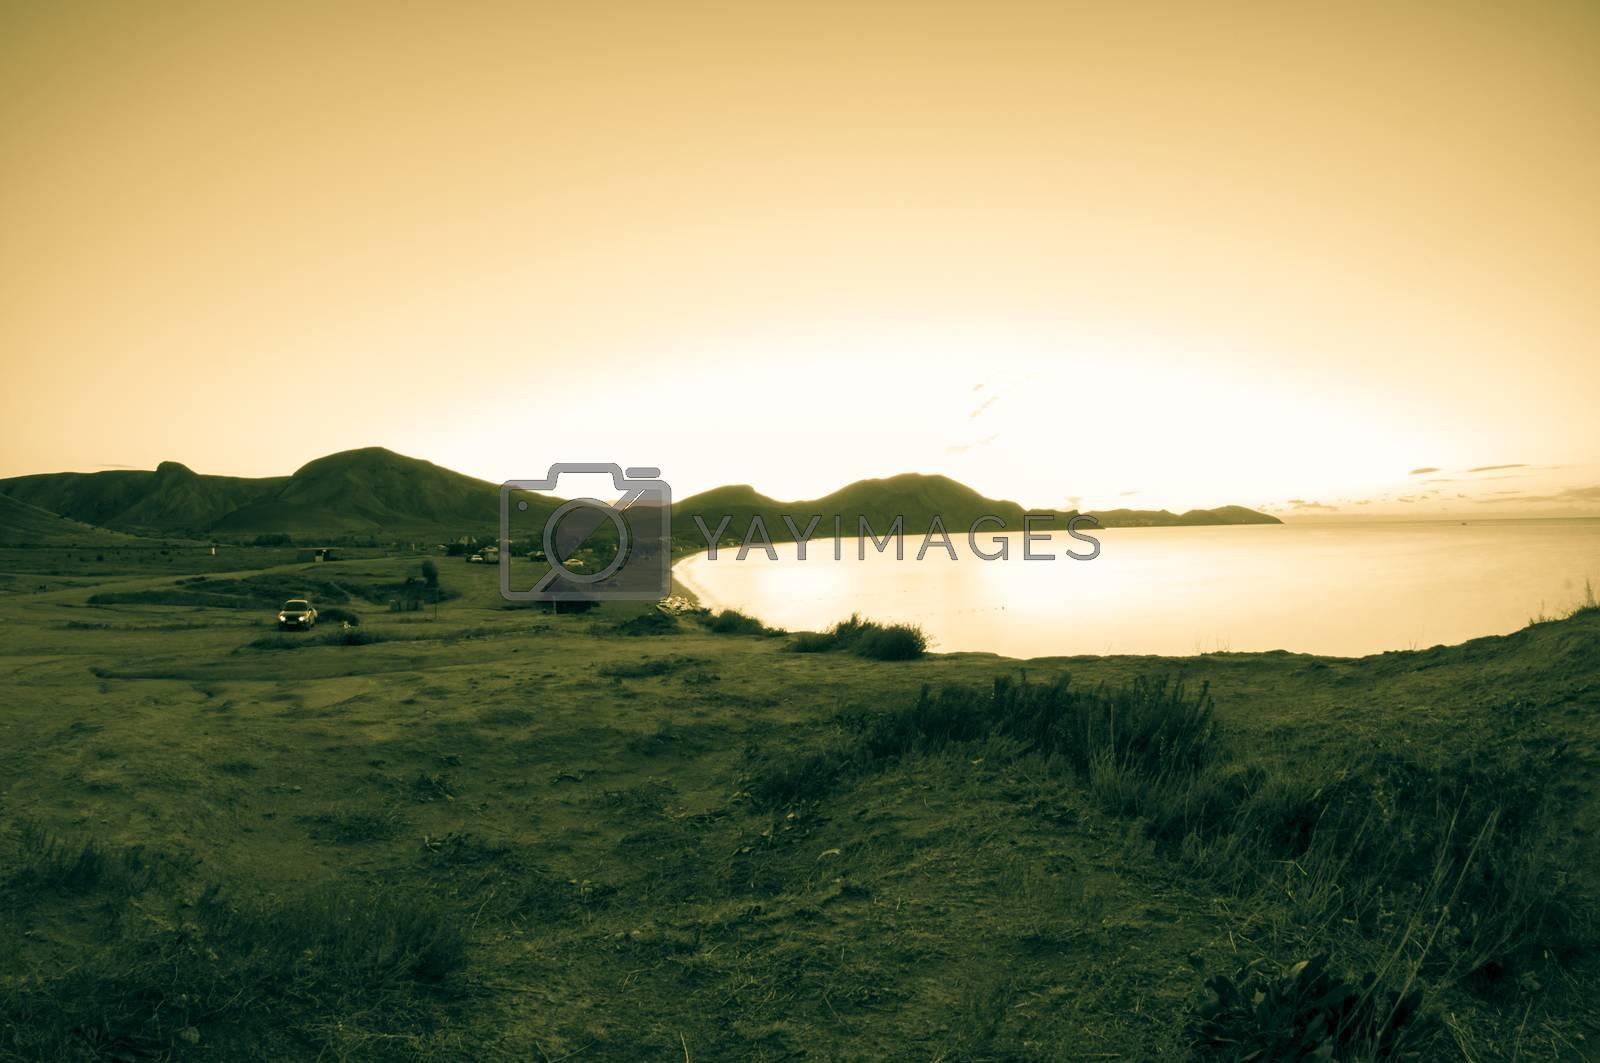 Morning sea. Camping on the beach. by bashta